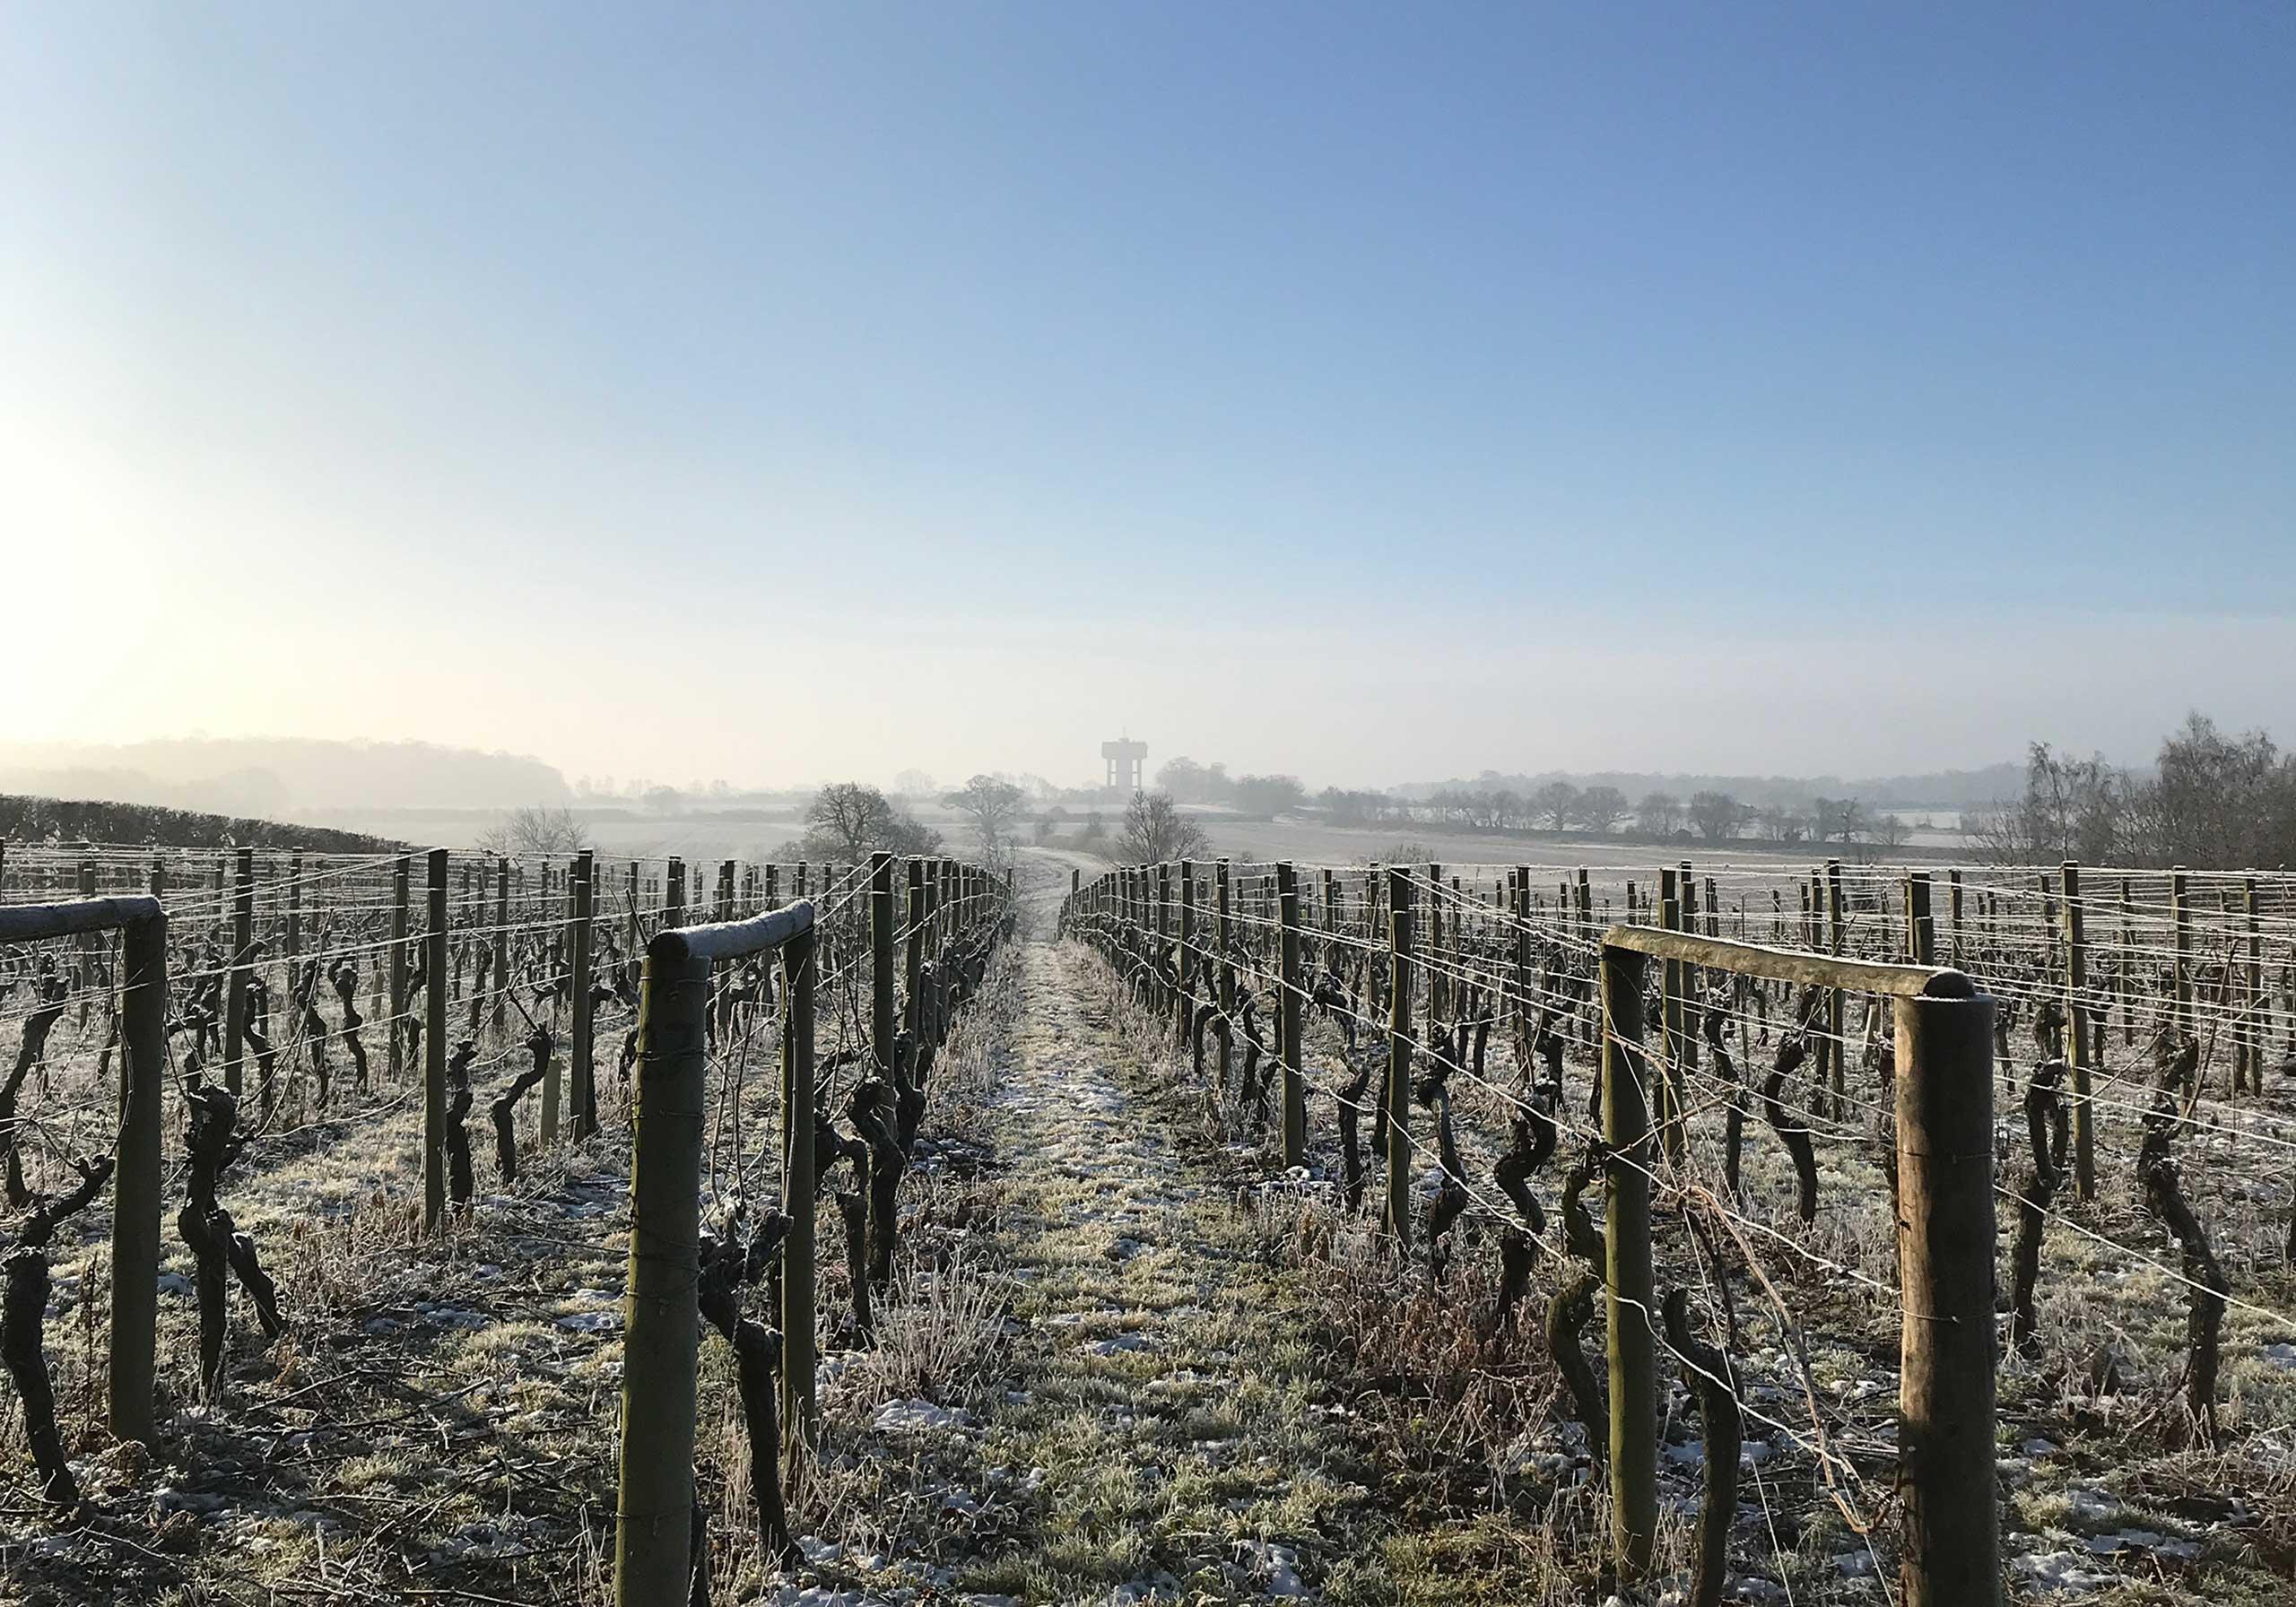 Wyken Vineyard